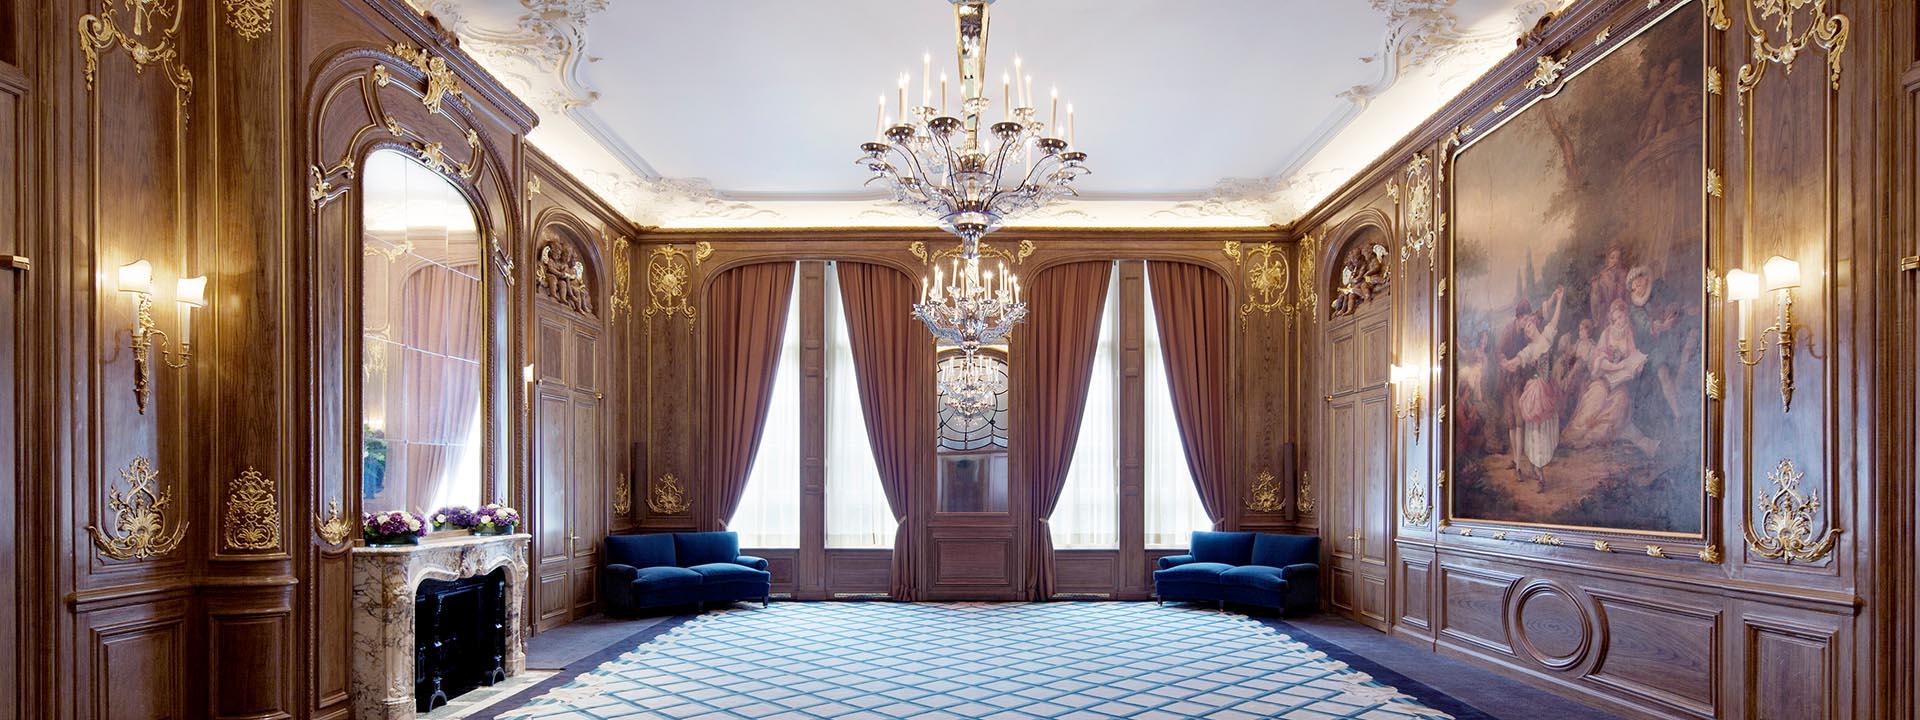 french-salon-claridges-charlotte-munro-luxury-weddings